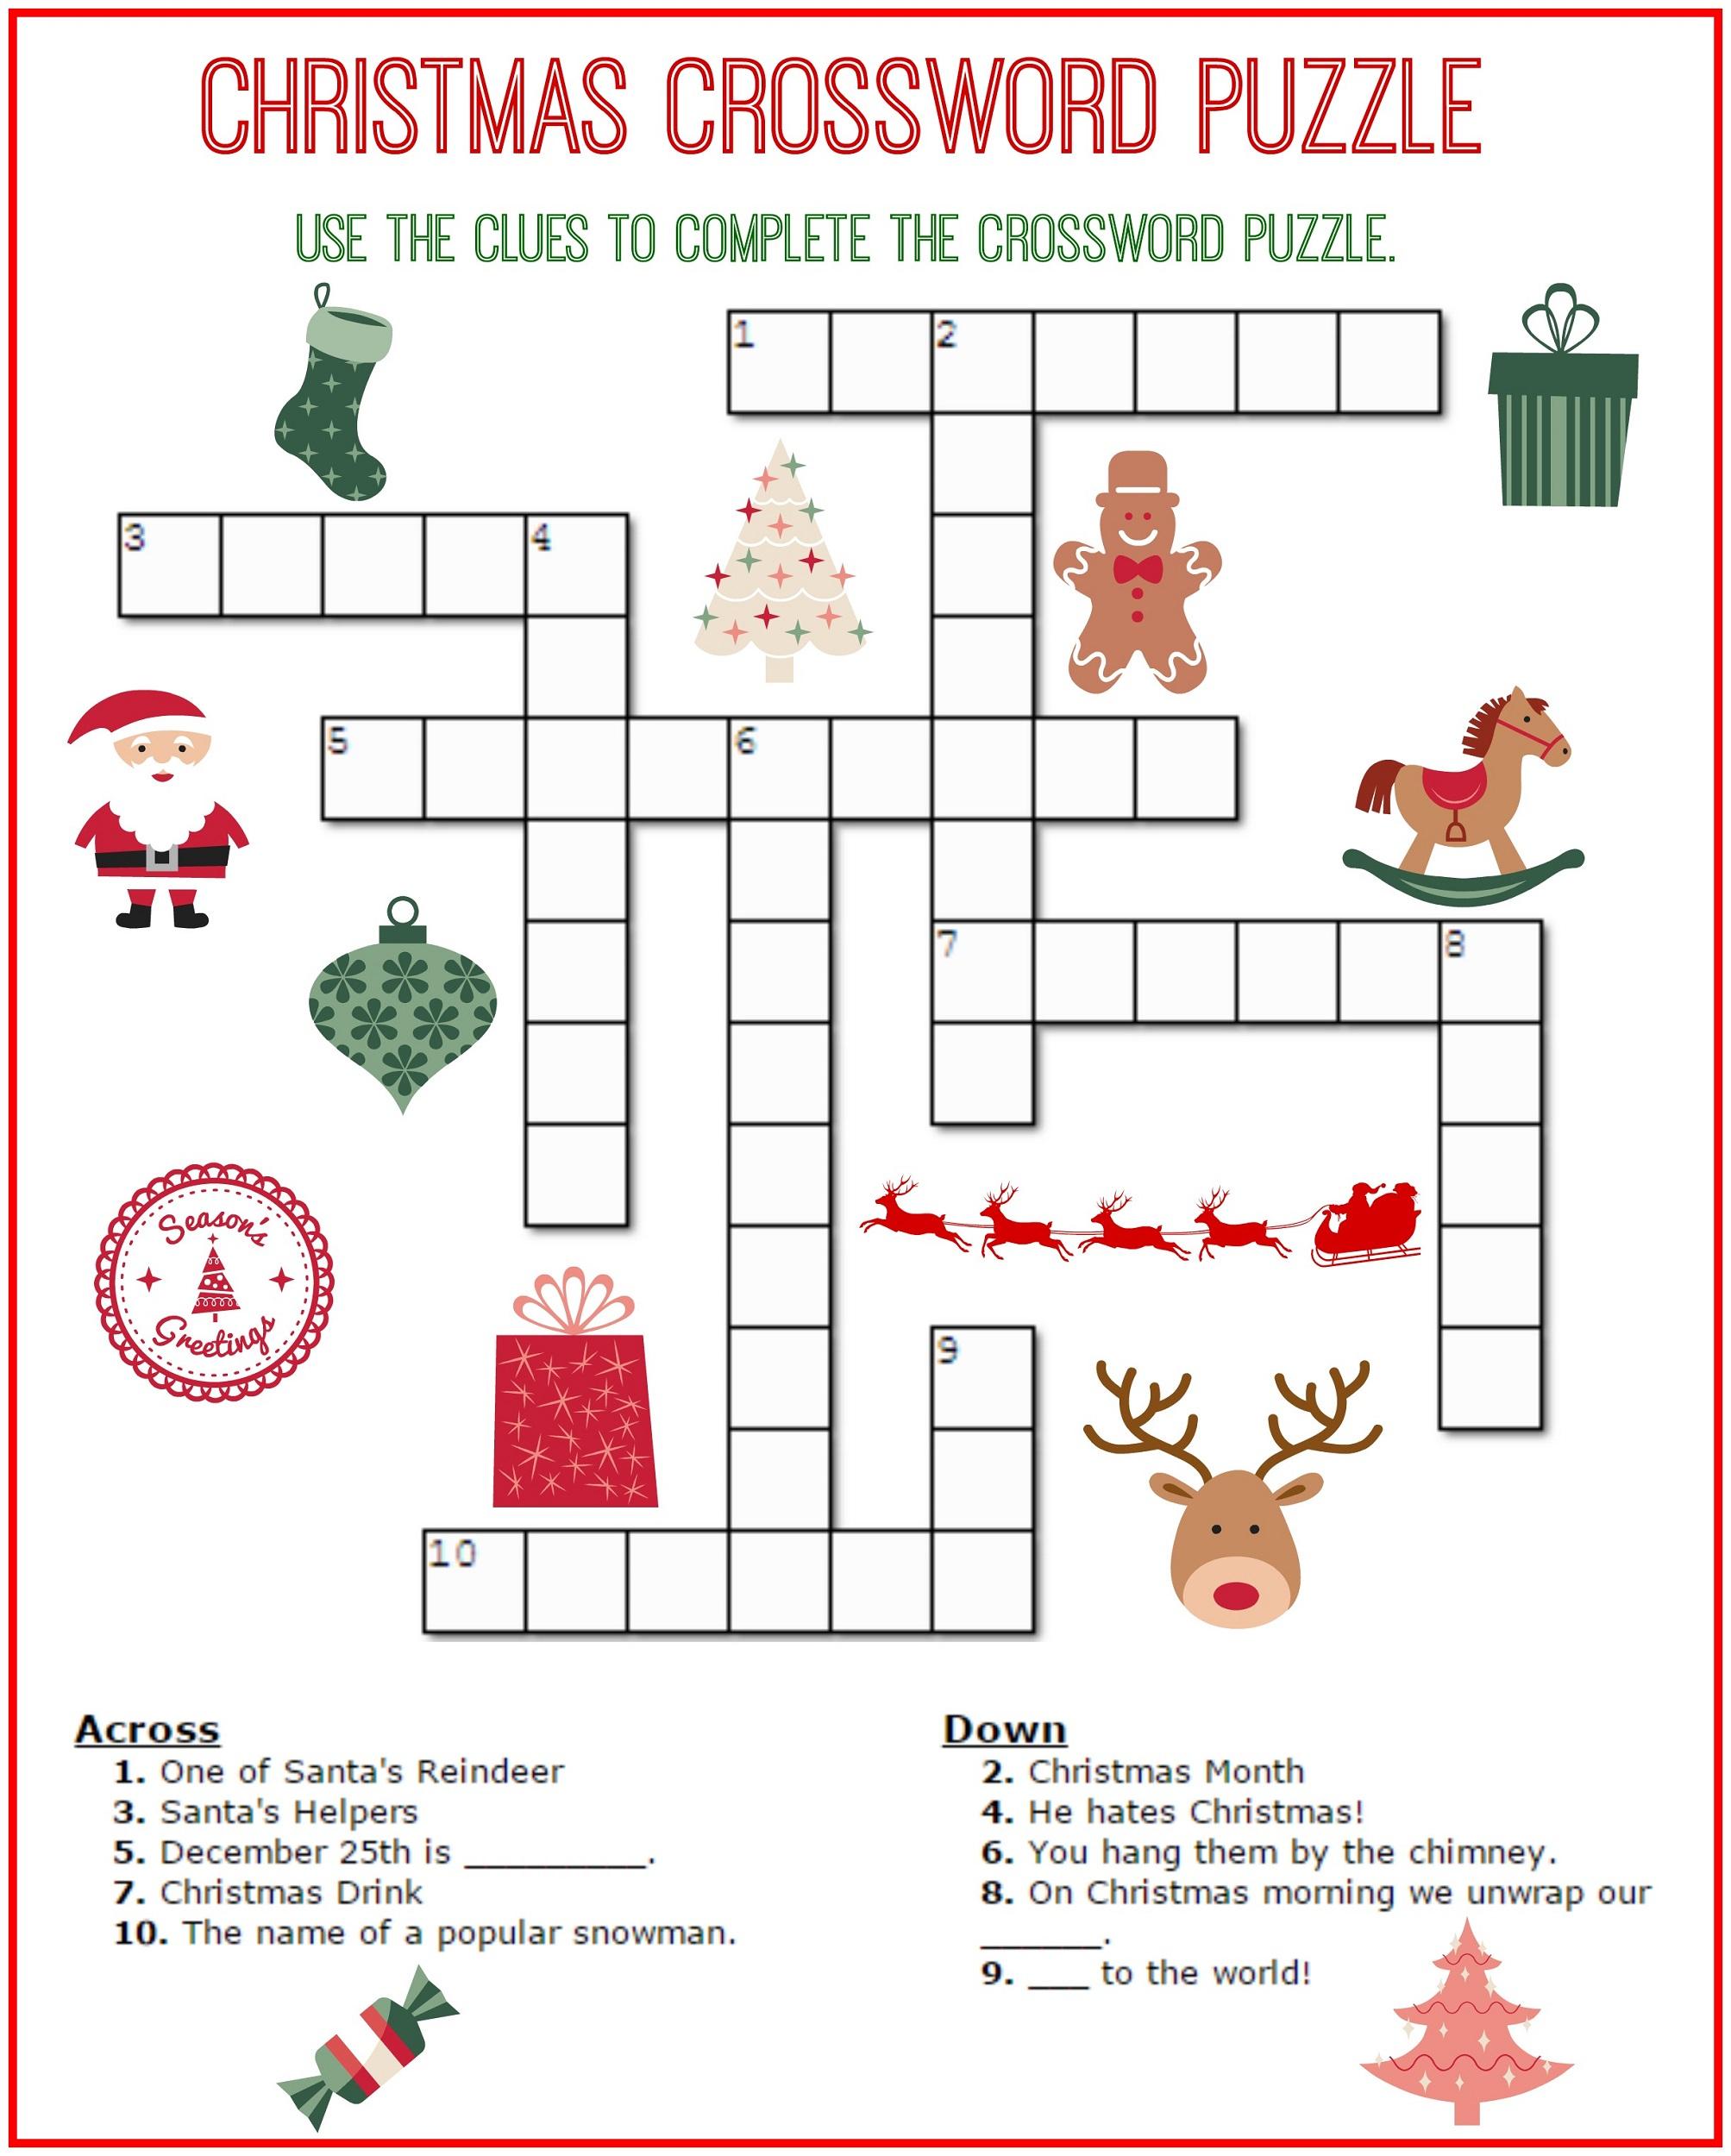 Crossword Puzzle Kids Printable 2017 | Kiddo Shelter - Printable Crossword Puzzles For Kids